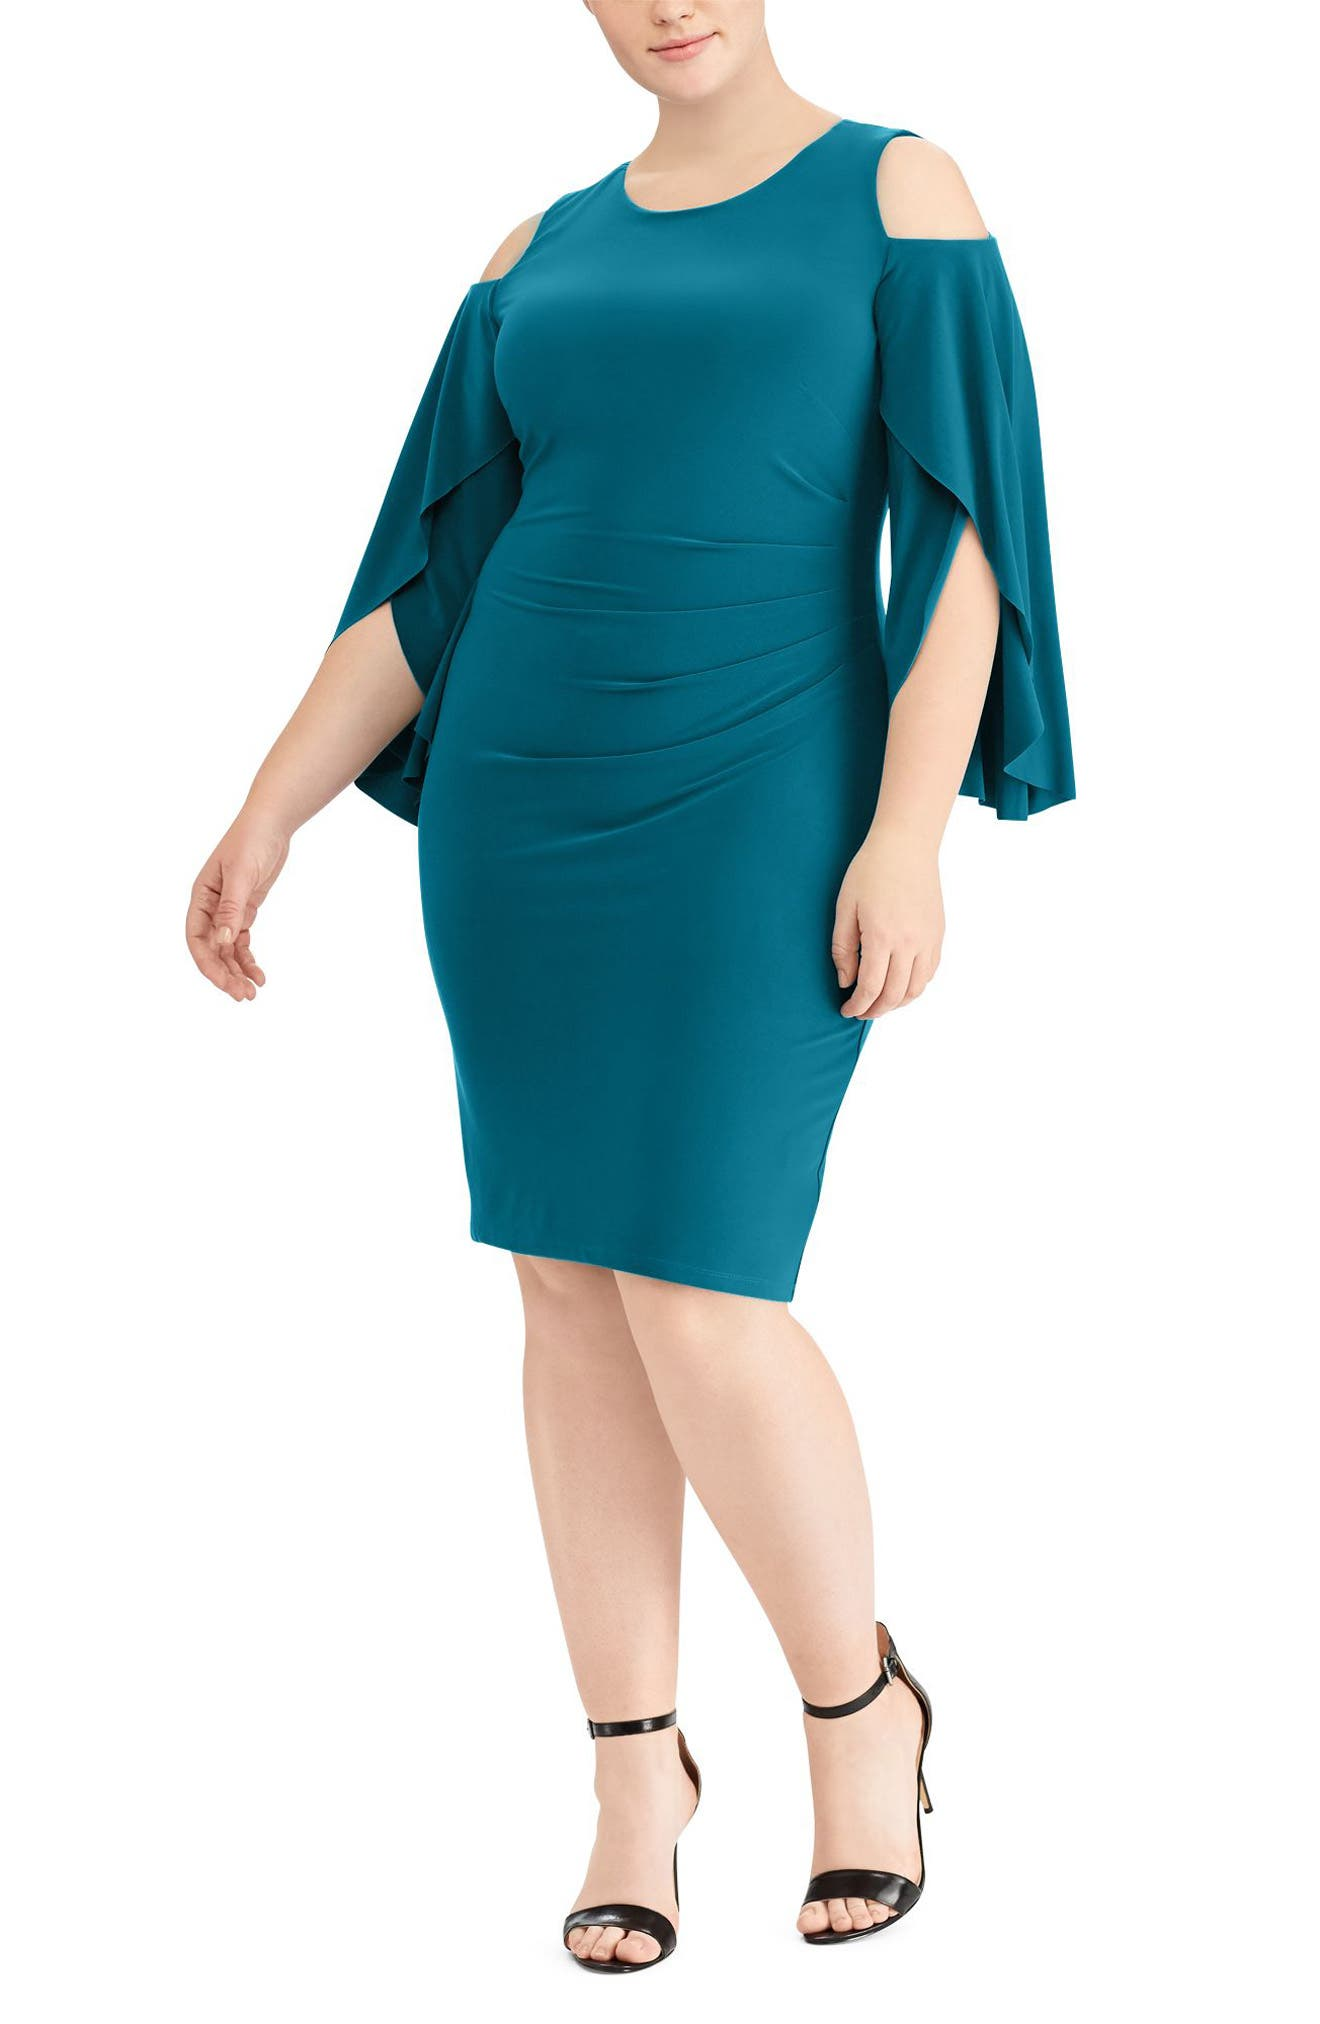 Alternate Image 1 Selected - Lauren Ralph Lauren Debbie Cold-Shoulder Dress (Plus Size)